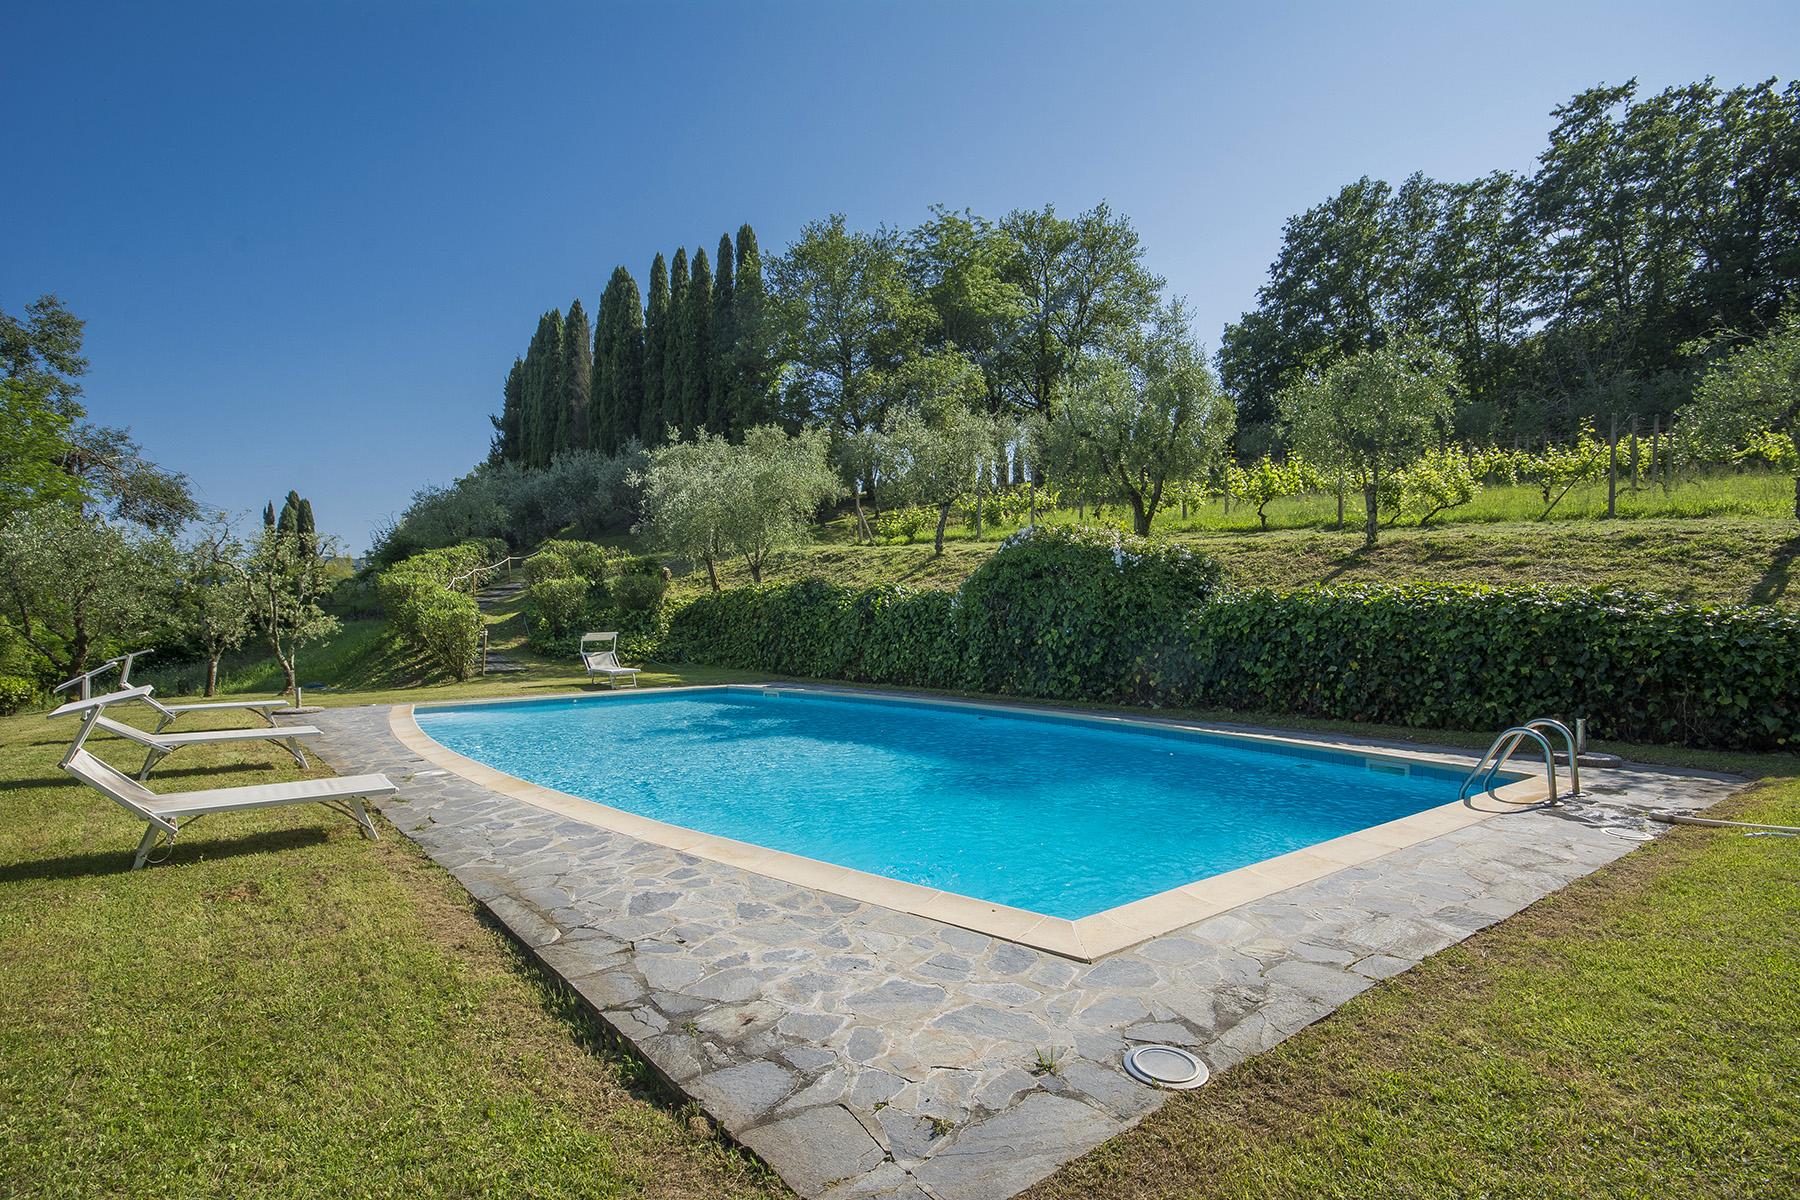 Villa in Vendita a Lucca: 5 locali, 600 mq - Foto 3